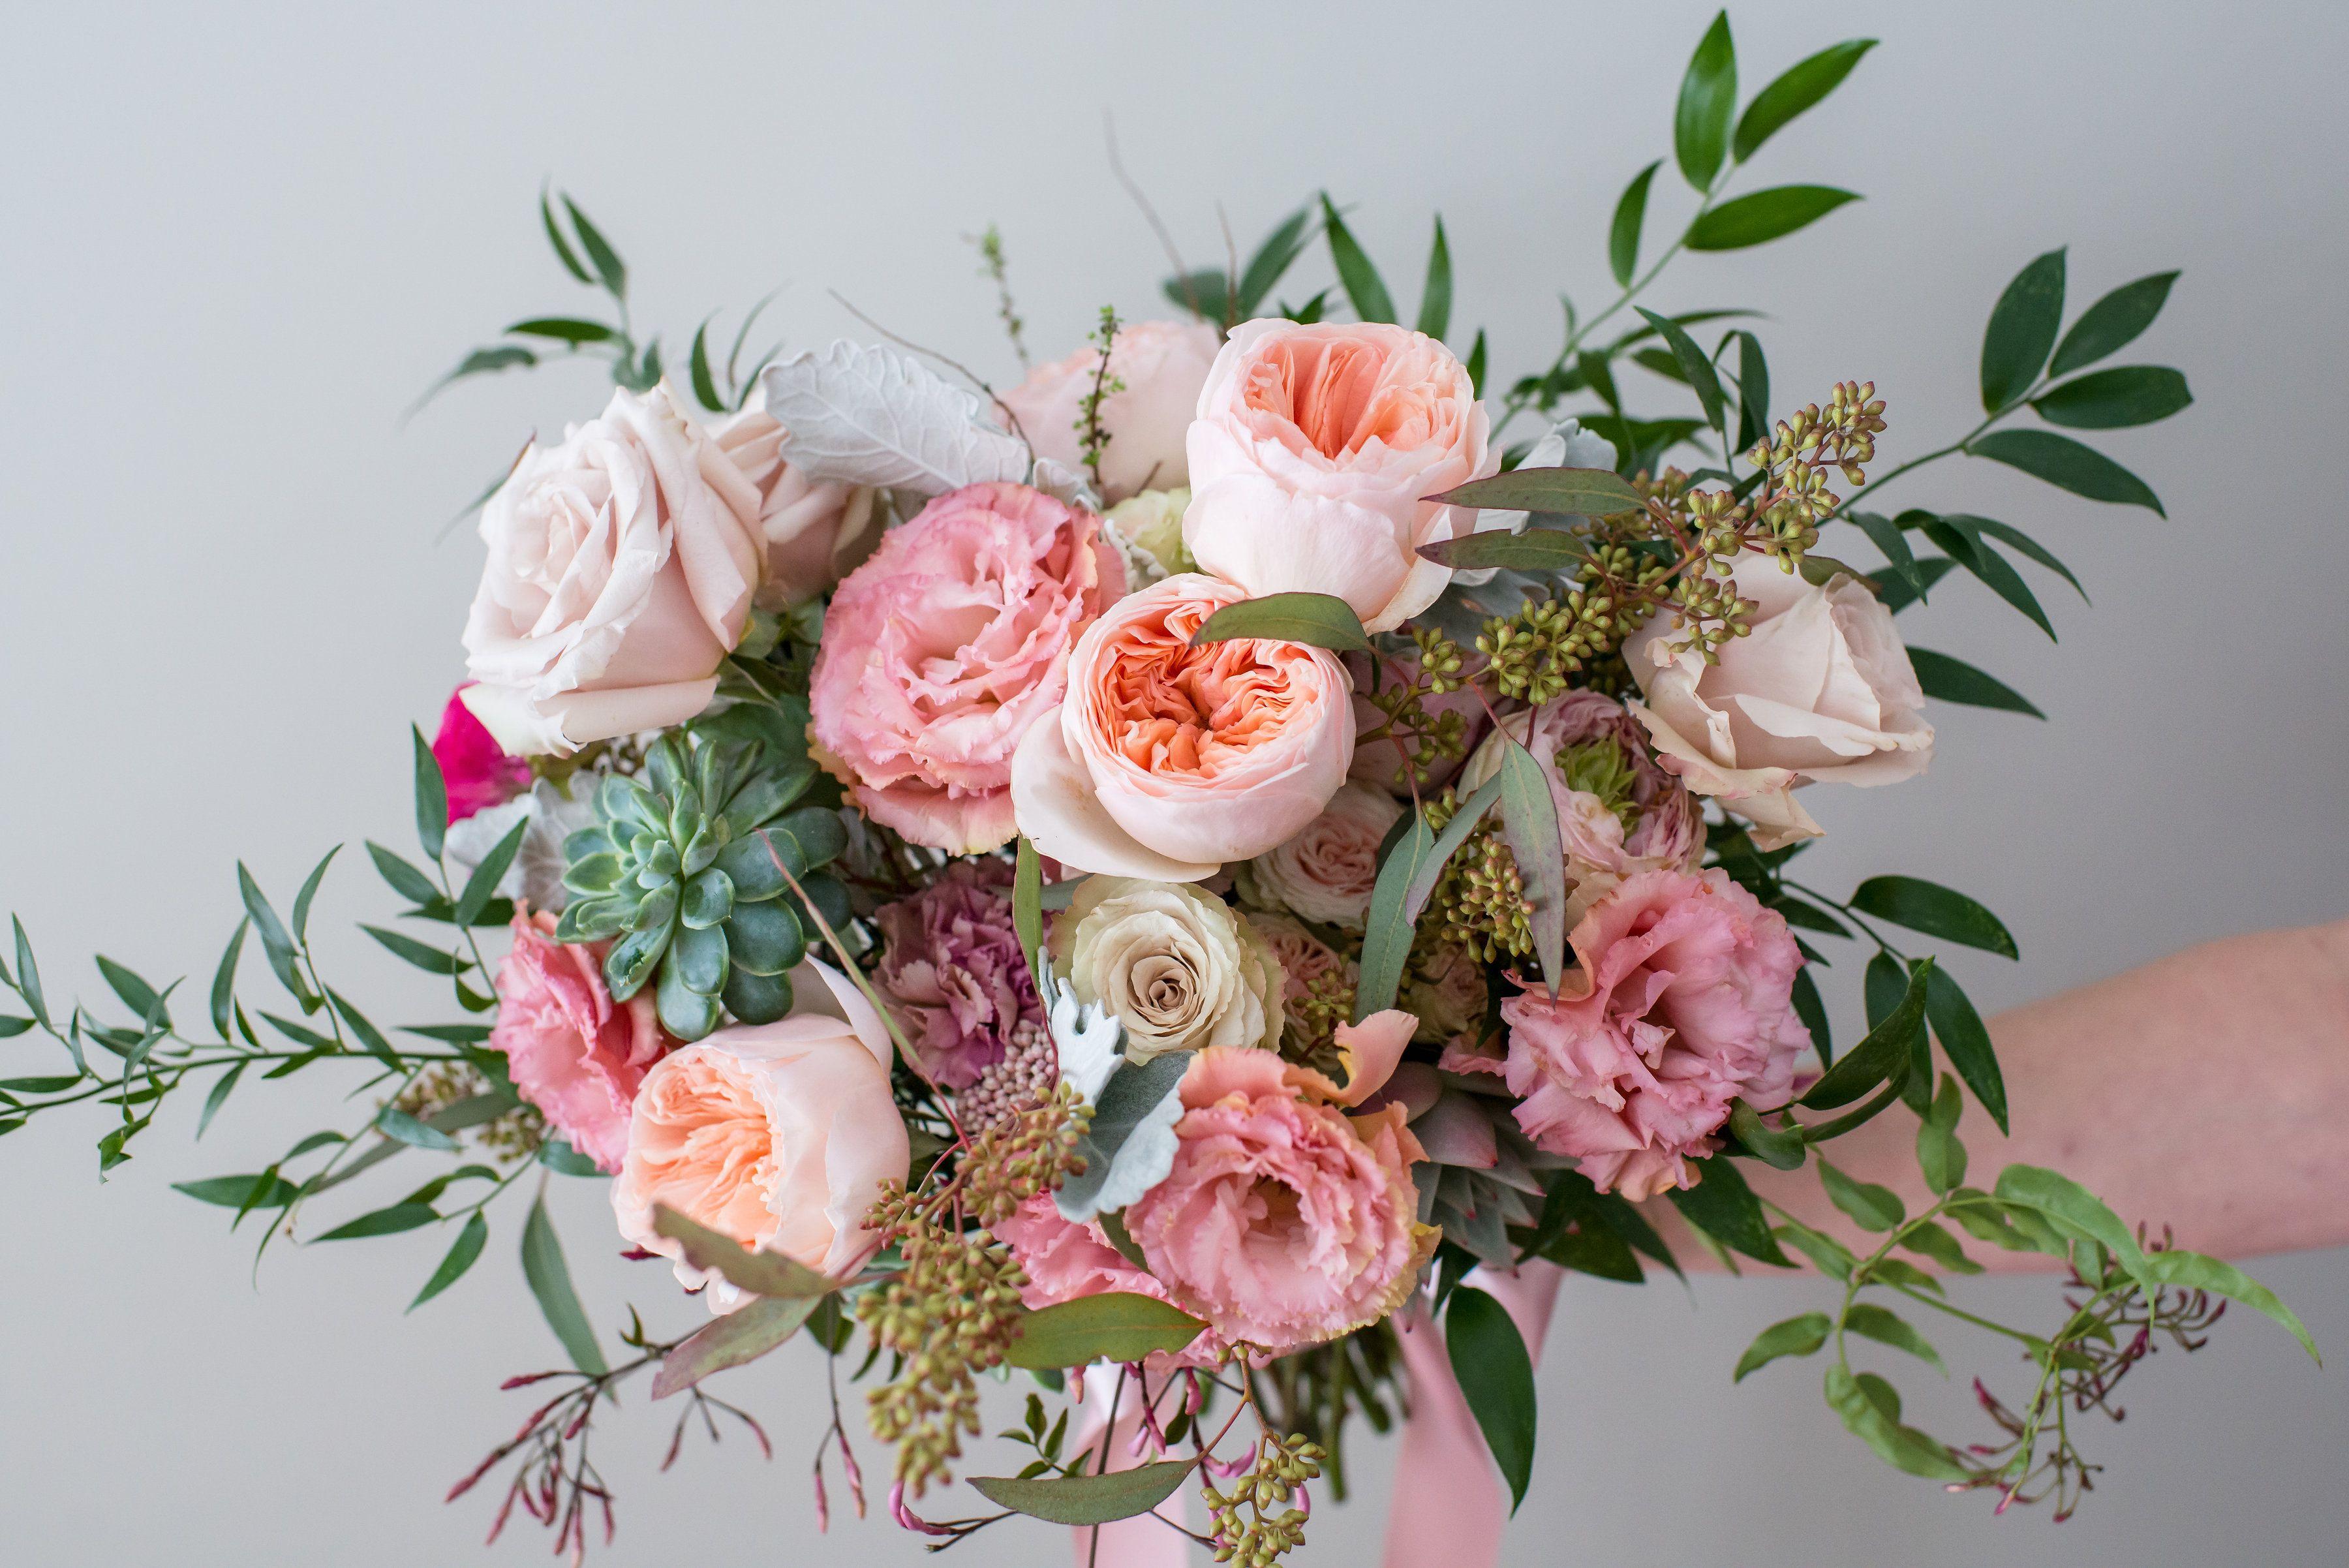 Romantic Wedding Bouquet In Peach Blush And Cream Tones With Garden Roses Lisianthus Roses Succulents Jasmine Wedding Bouquets Floral Decor Maine Wedding